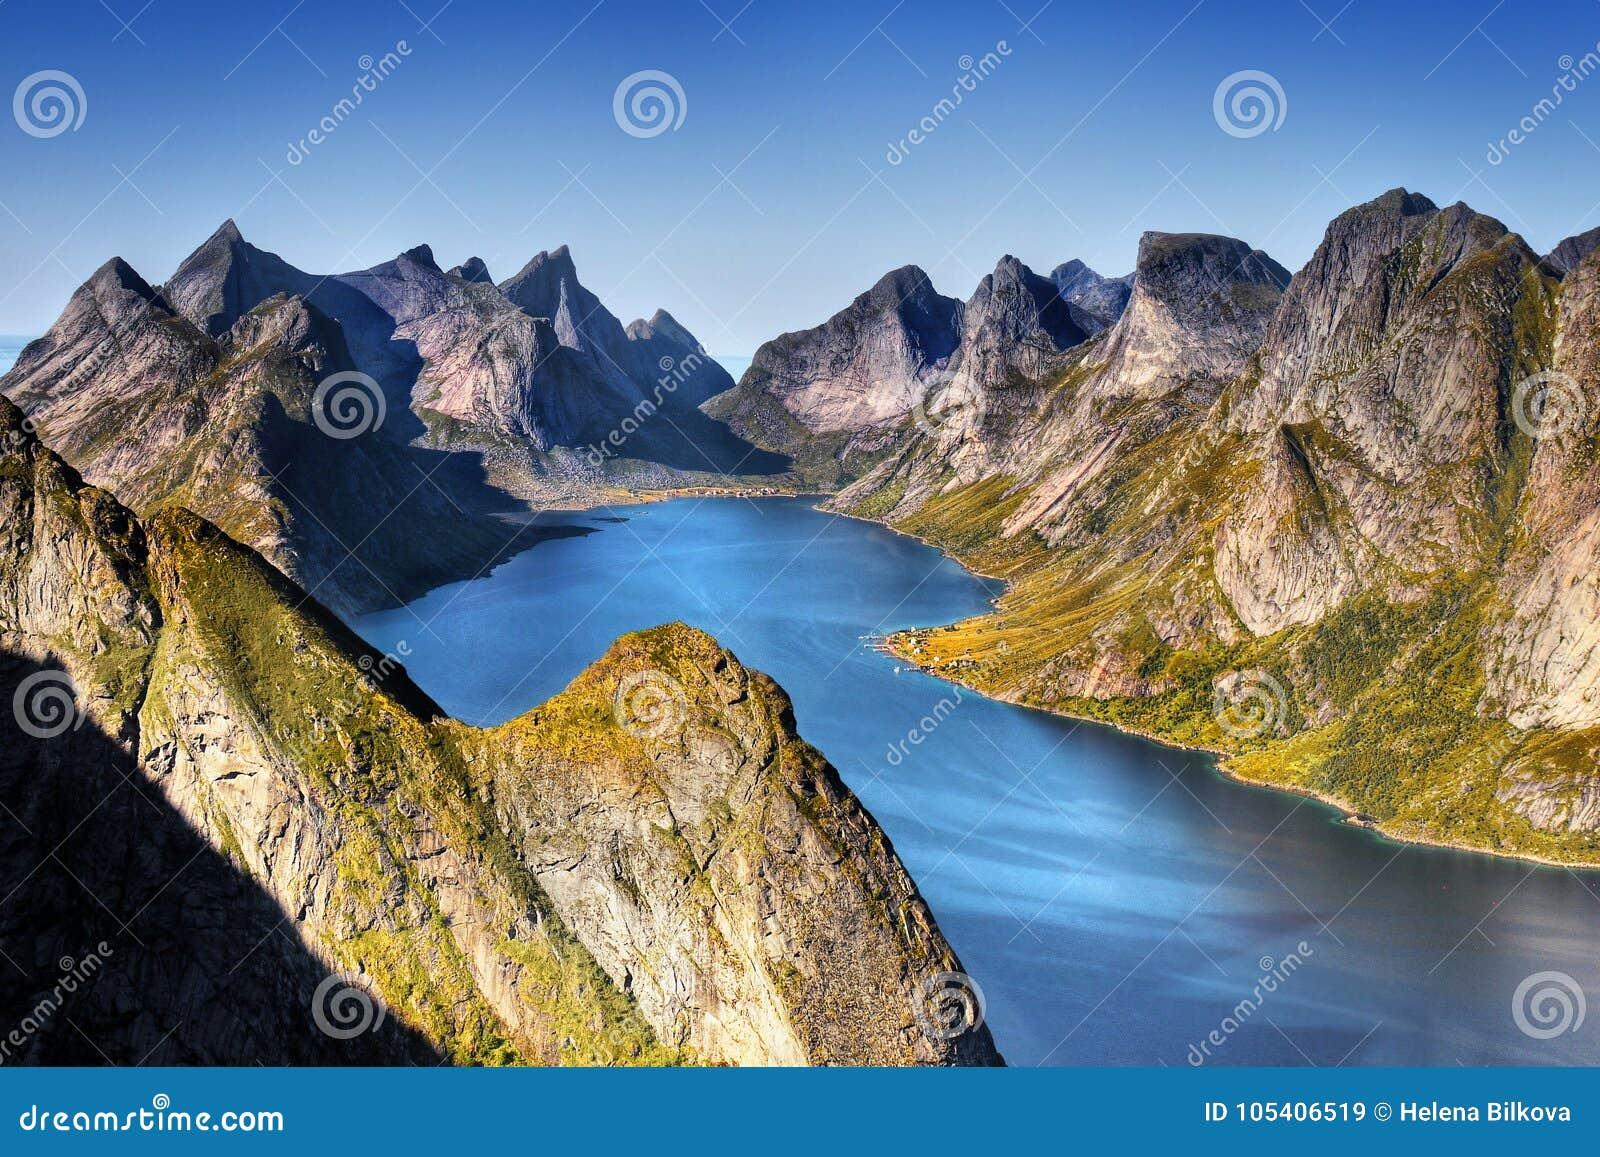 Norway, Lofoten Islands, Coast Landscape Mountains Fjords